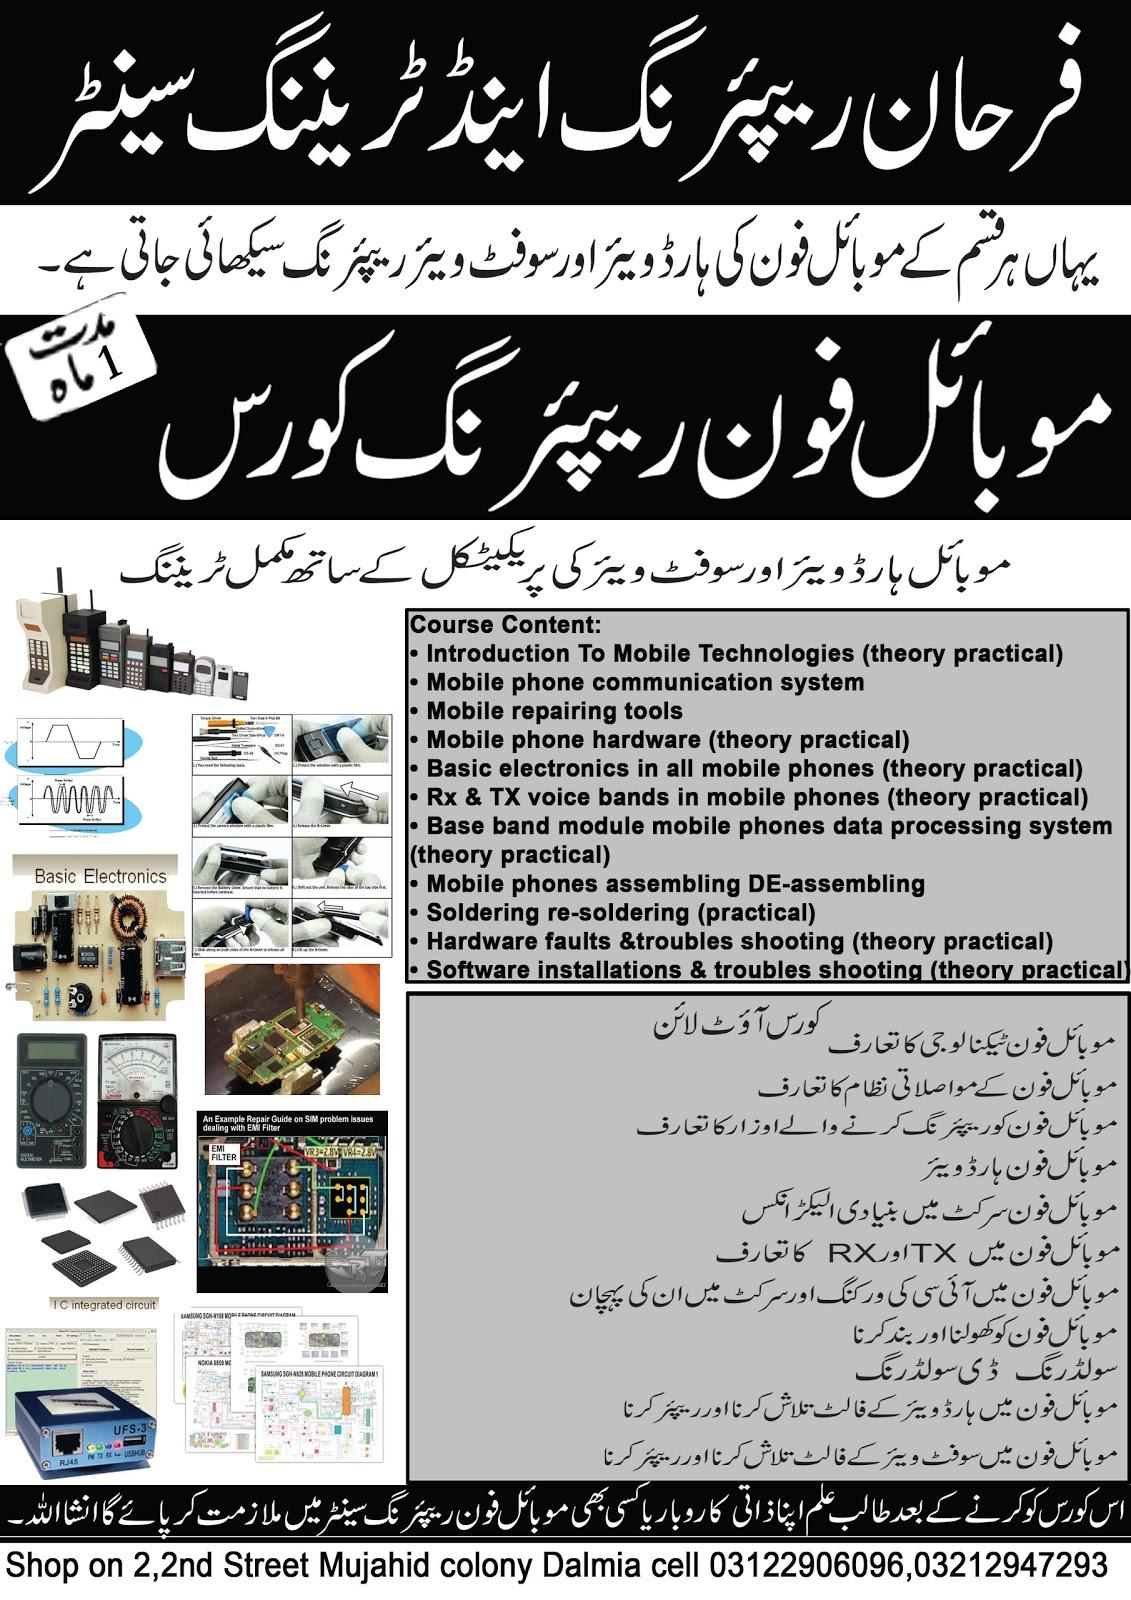 mobile repair course shop in karachi. software cell phone repairing